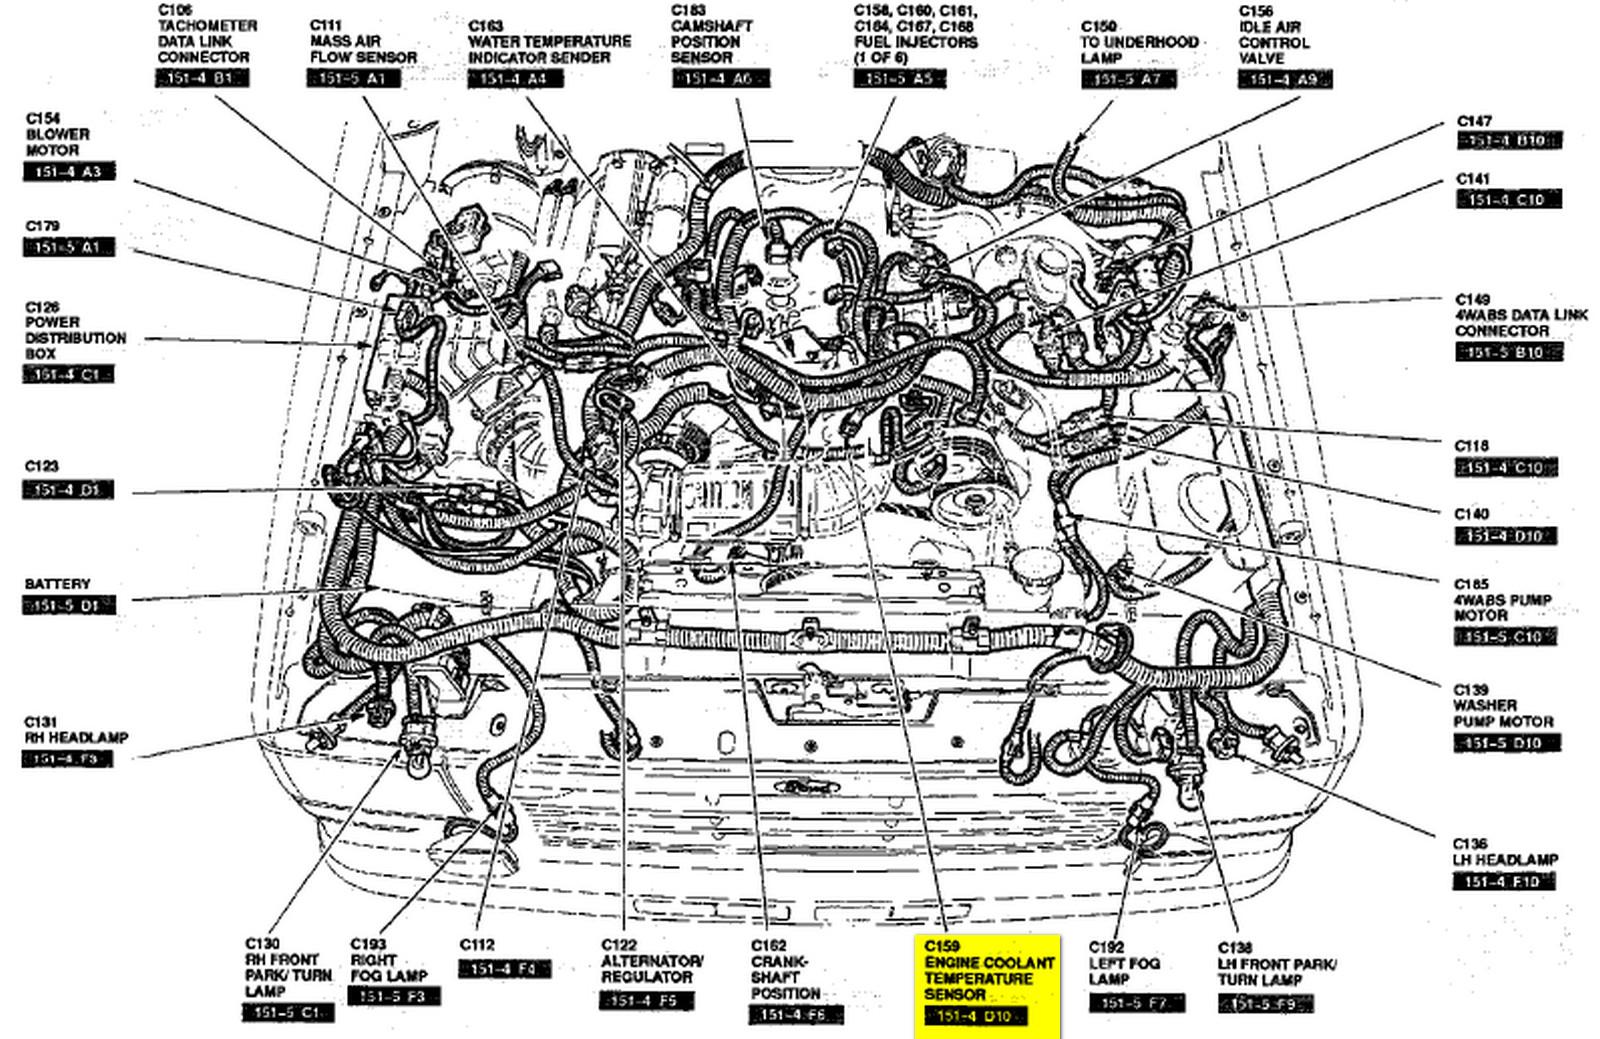 wiring diagram for 7 3 sel engine 94 with Ect Sensor Location 1999 Ford F350 Sel on Engine Diagram 1989 Ford 7 3l Sel also 7 3 Powerstroke Sel Engine Diagram furthermore Ford 6 7 Sel Engine Serpentine Belt Diagram further Ect Sensor Location 1999 Ford F350 Sel moreover 7 3 Idi Fuel Return Line Diagram.